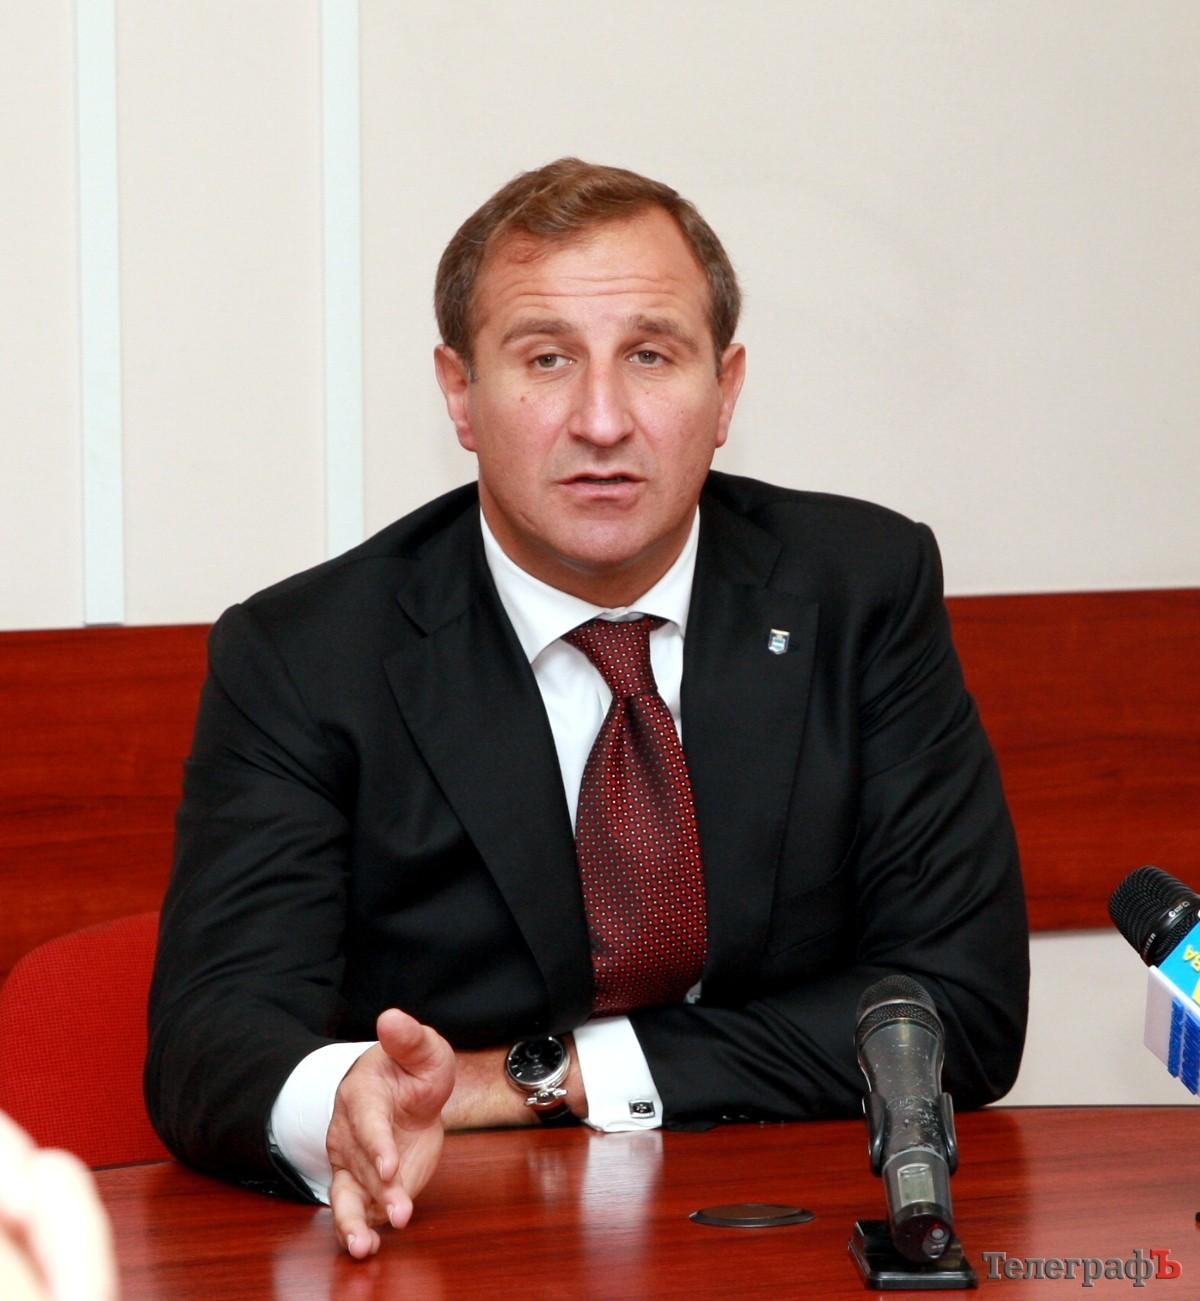 СМИ: застрелен мэр Кременчуга Олег Бабаев